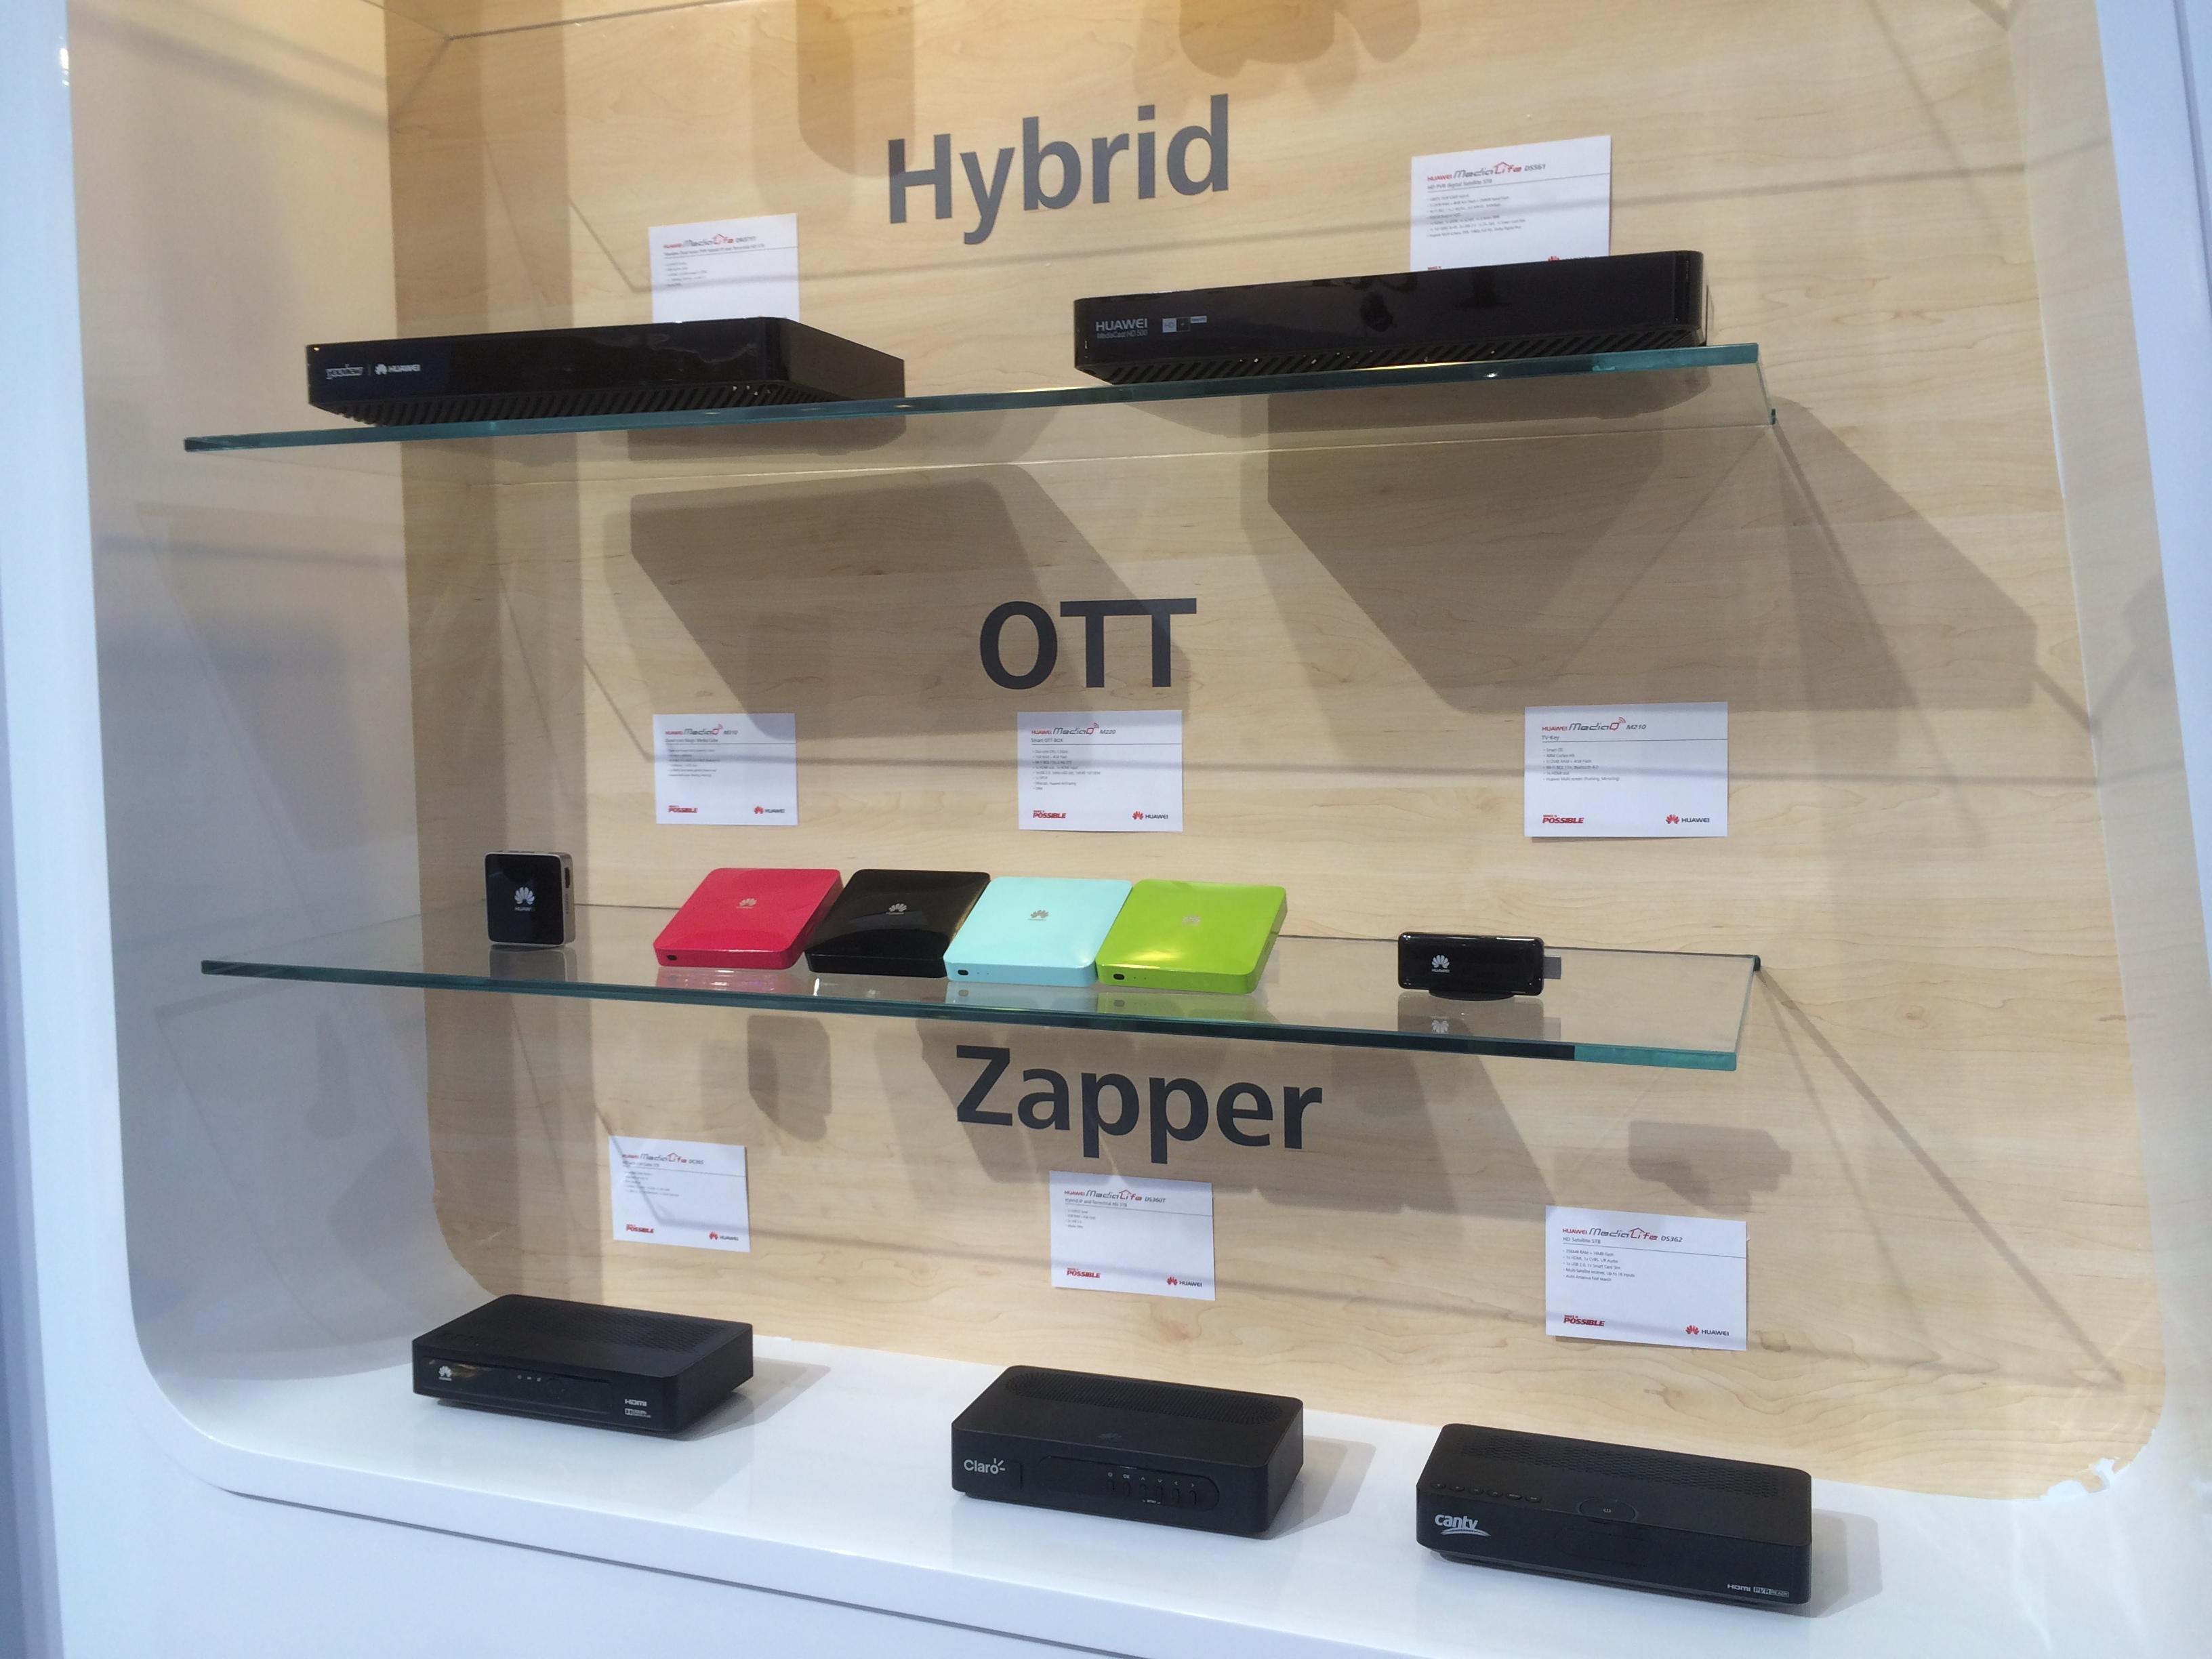 Android-ресиверы Huawei на выставке CES 2014